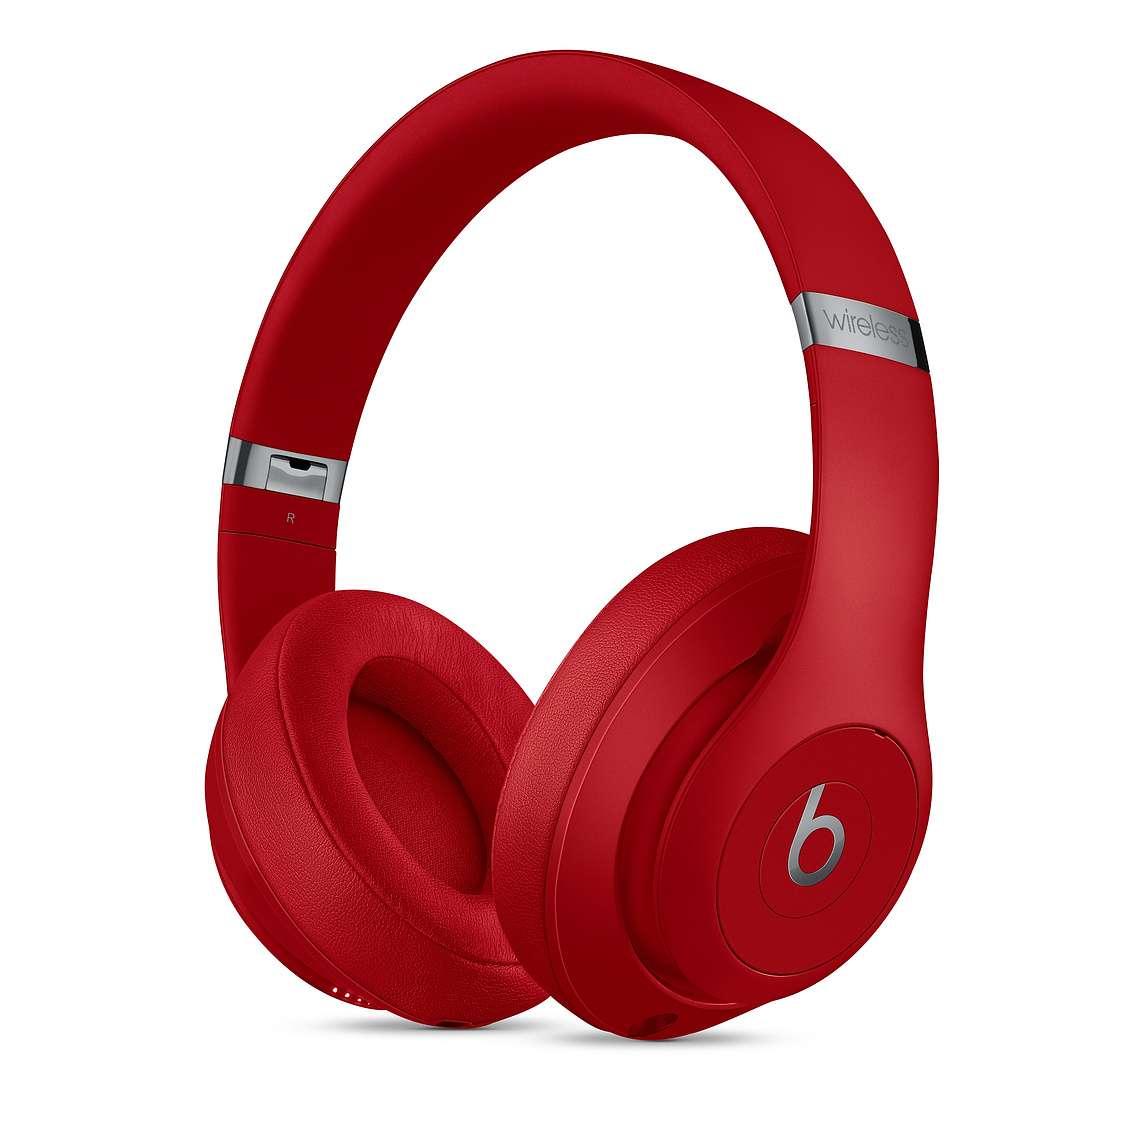 Imagen producto Beats studio wireless 3 3